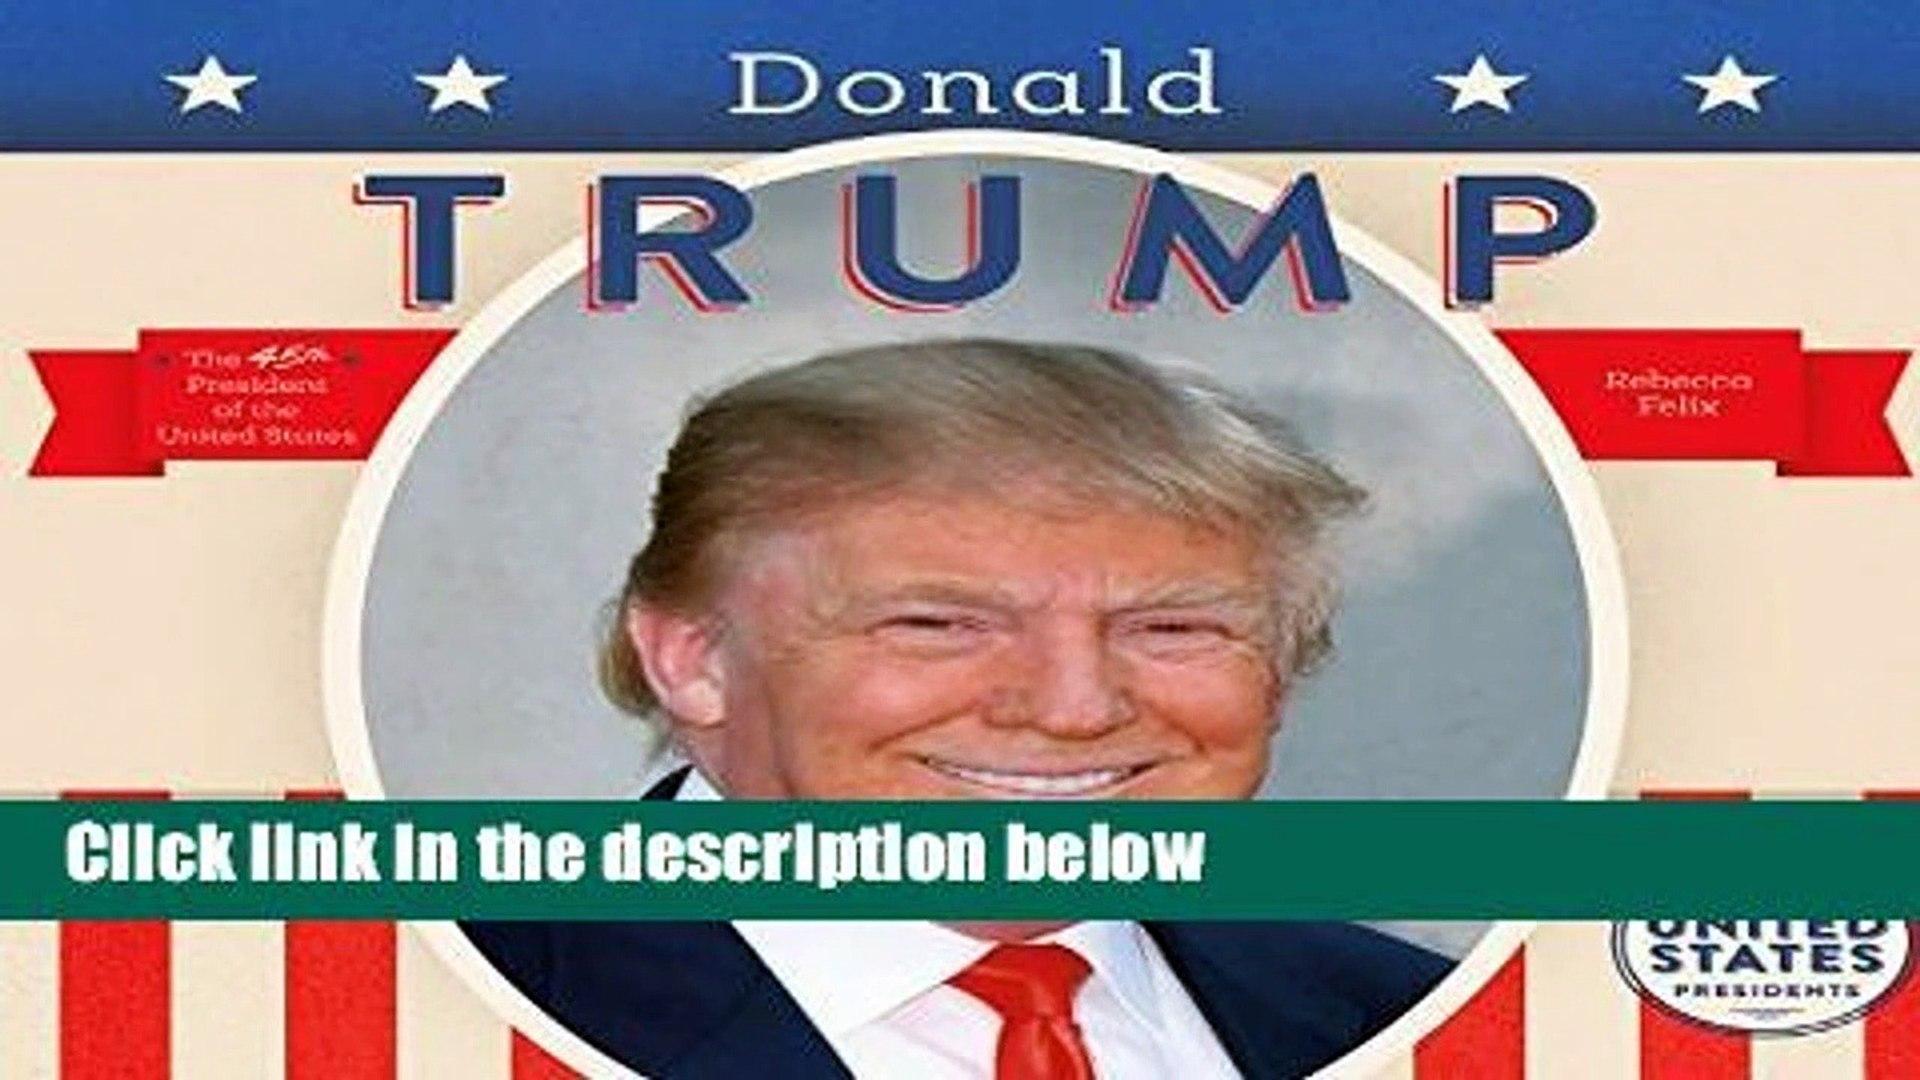 Donald Trump (United States Presidents *2017)